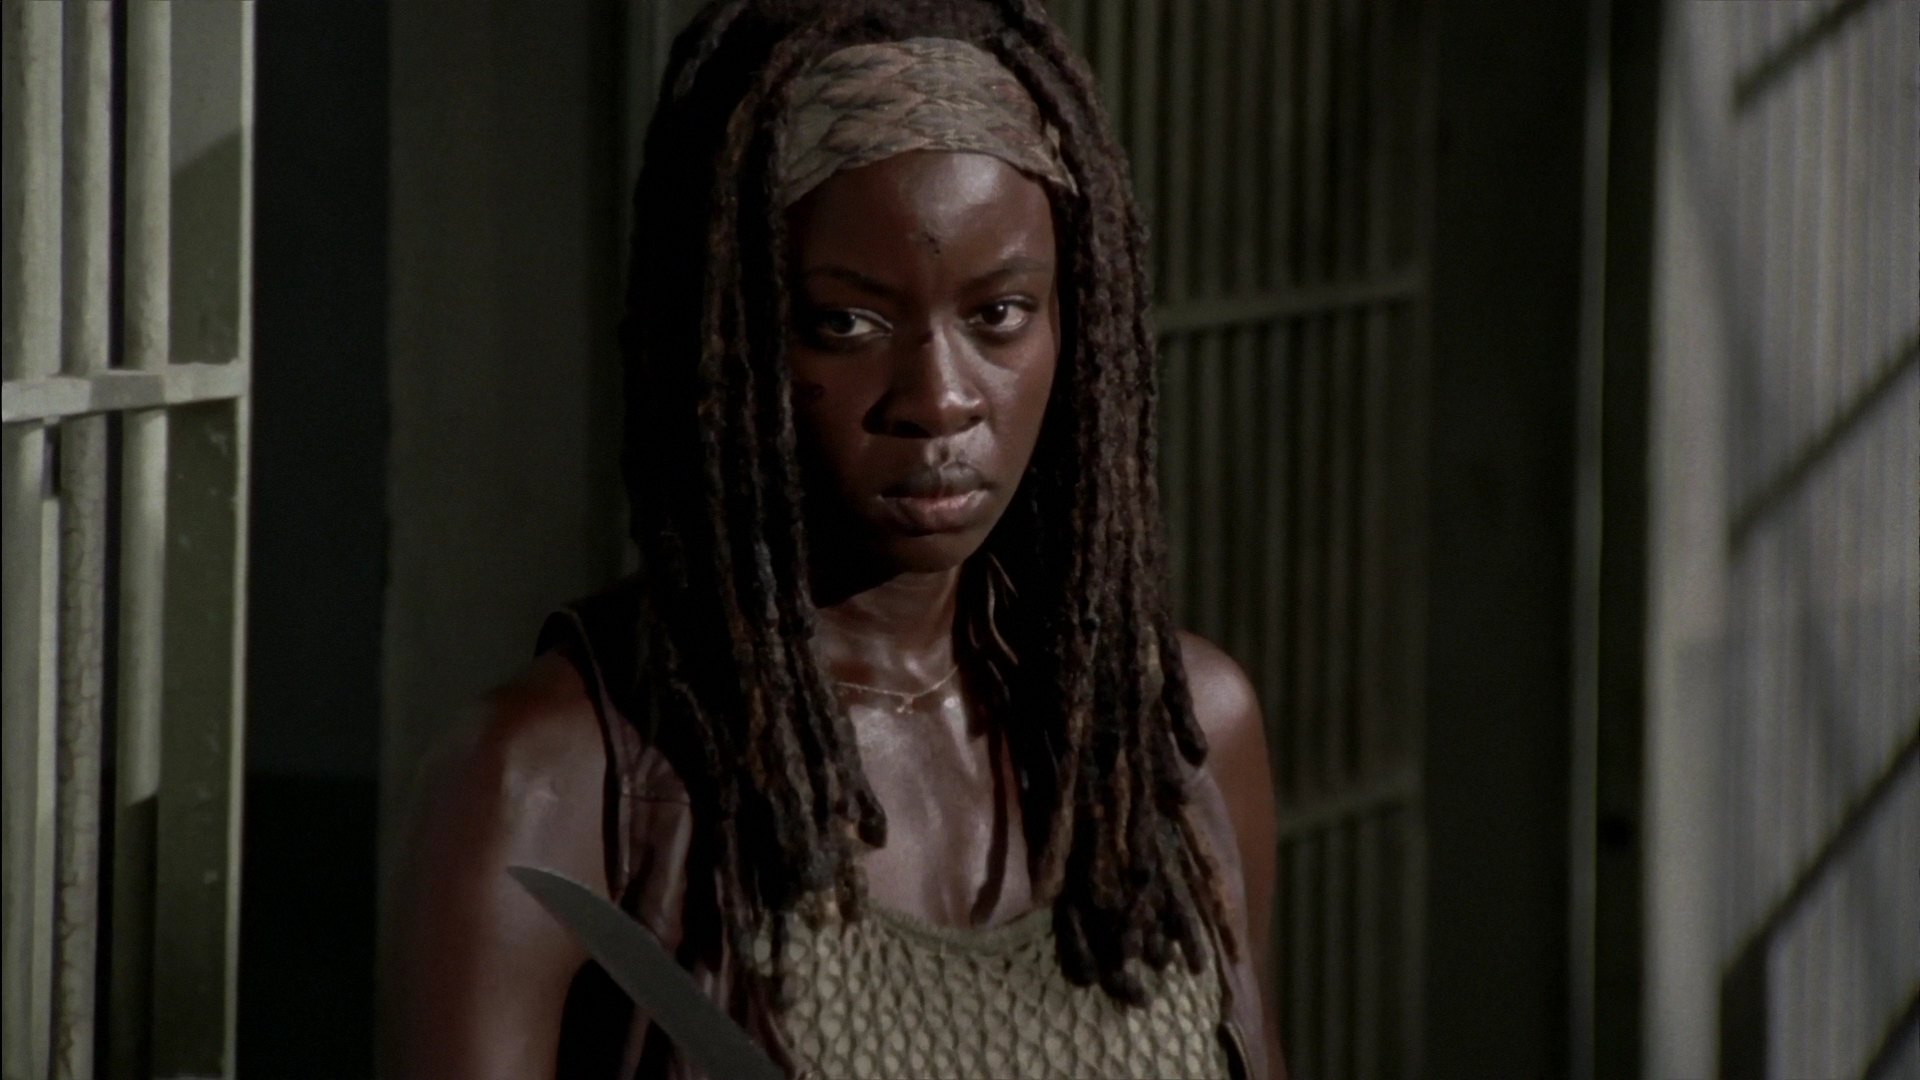 'The Walking Dead' Season 3 Episode 11 Captures